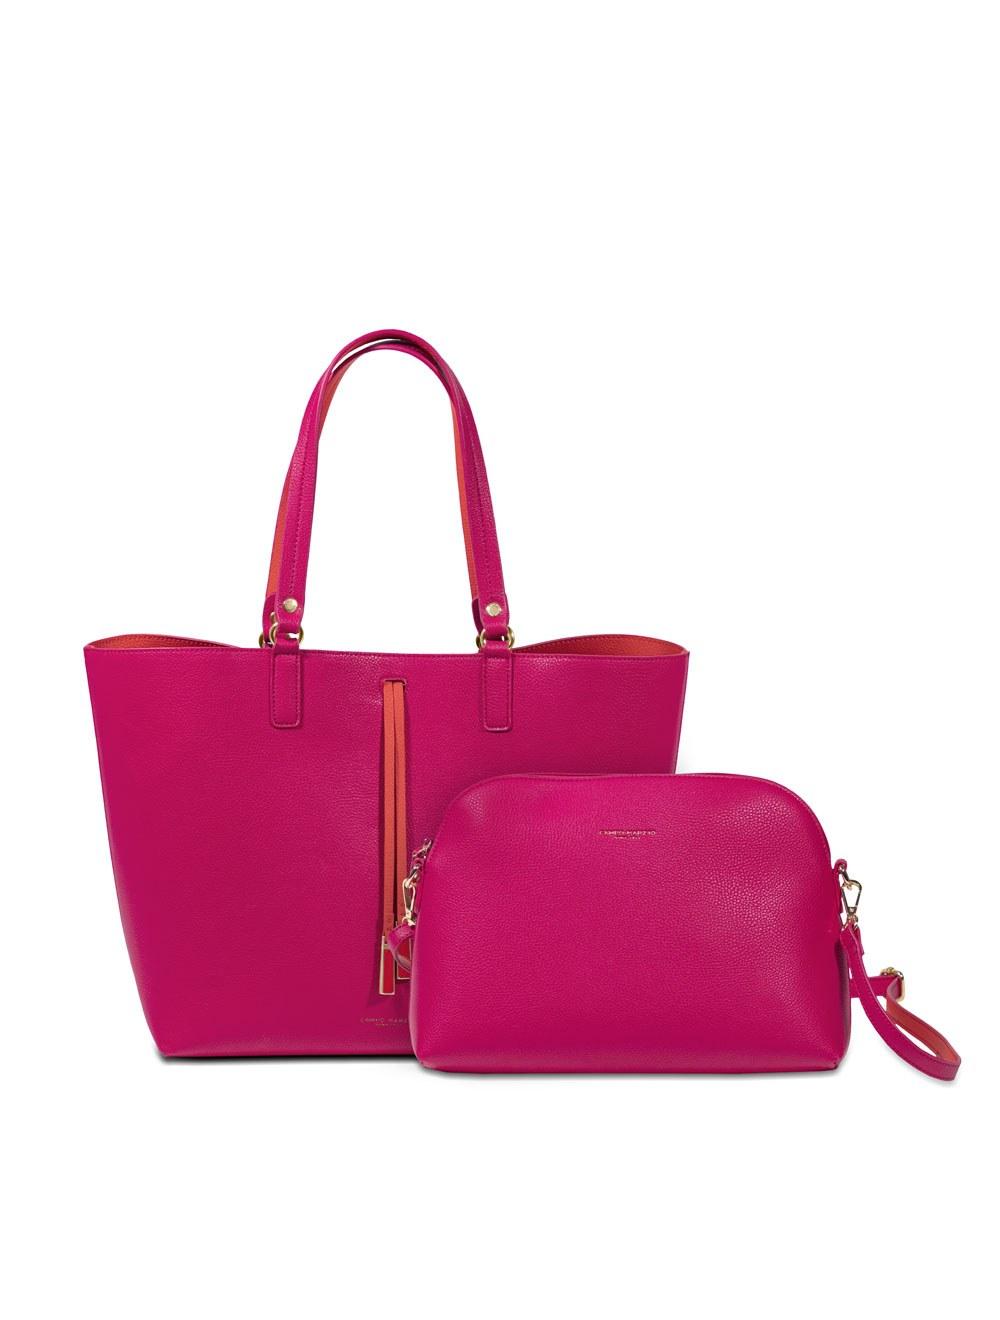 Shopper Bag With Inner Bag Maxi